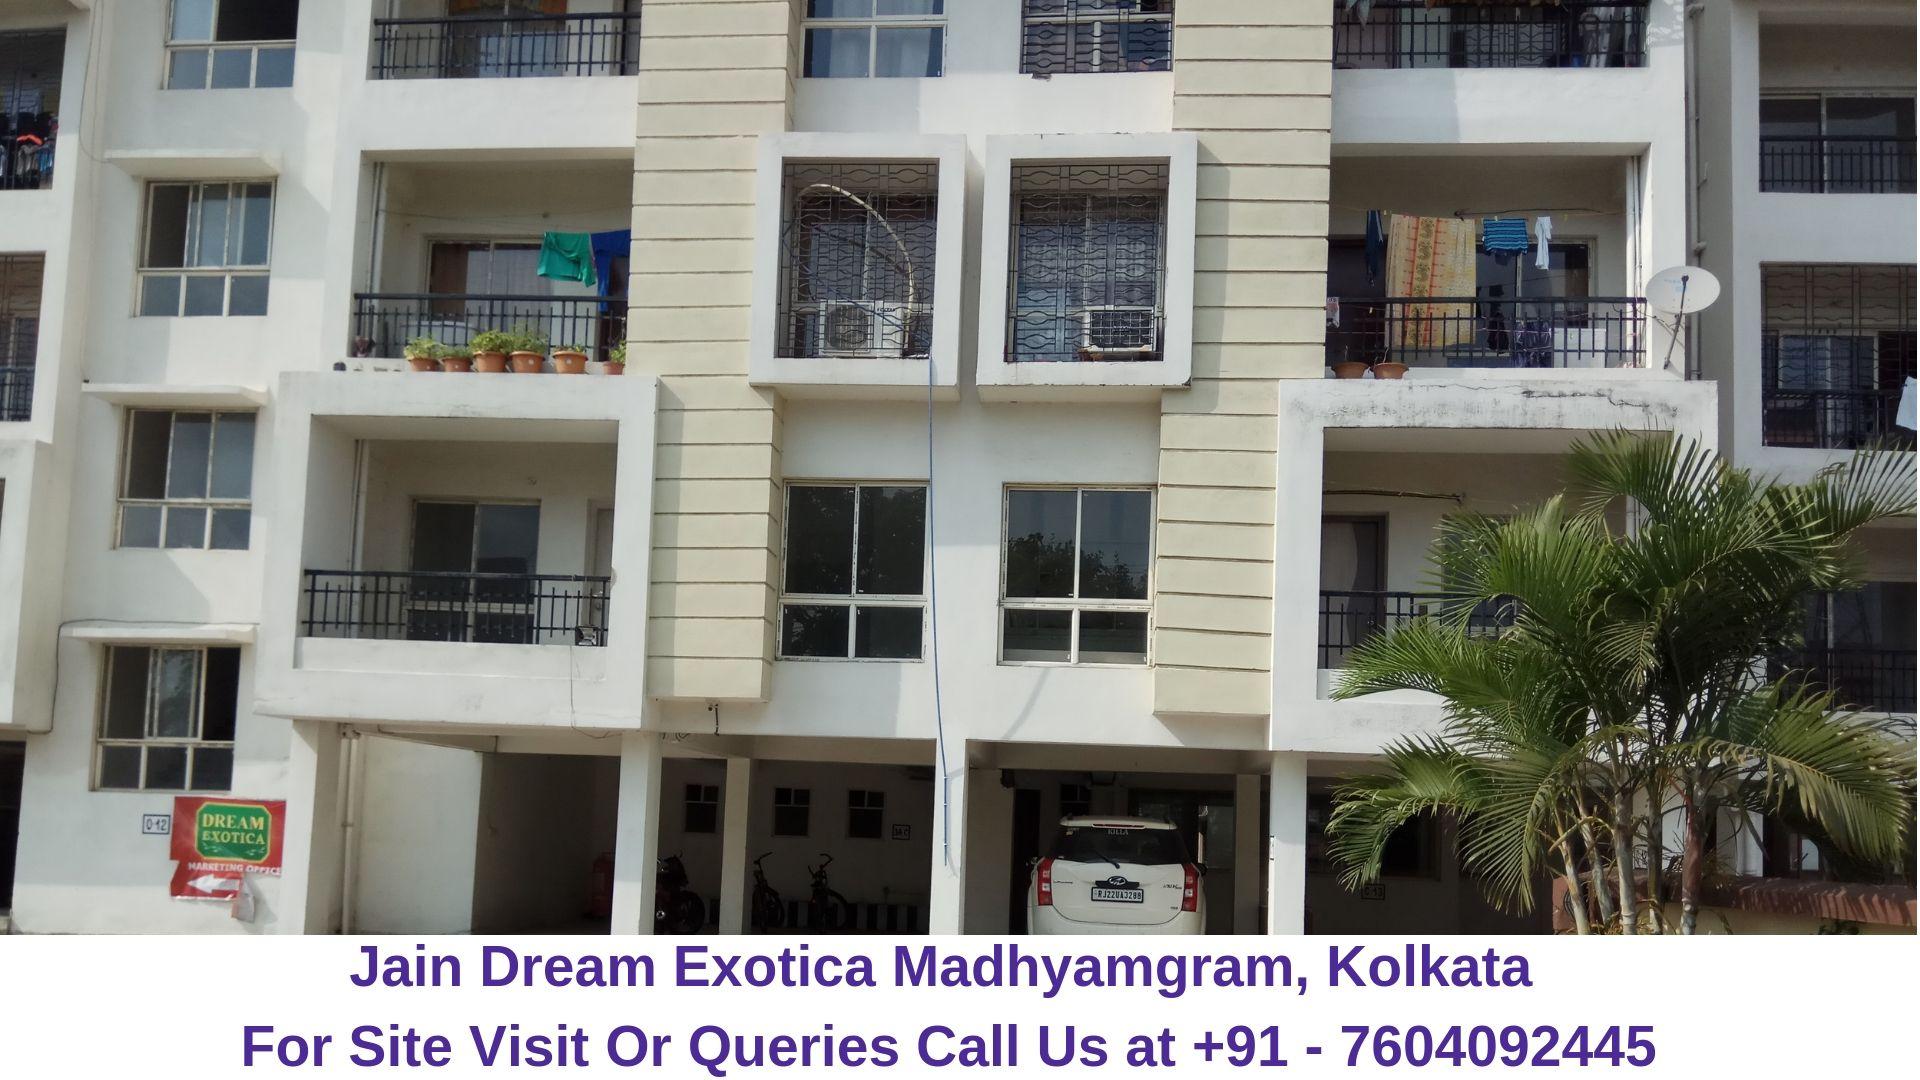 Jain Dream Exotica Madhyamgram Kolkata